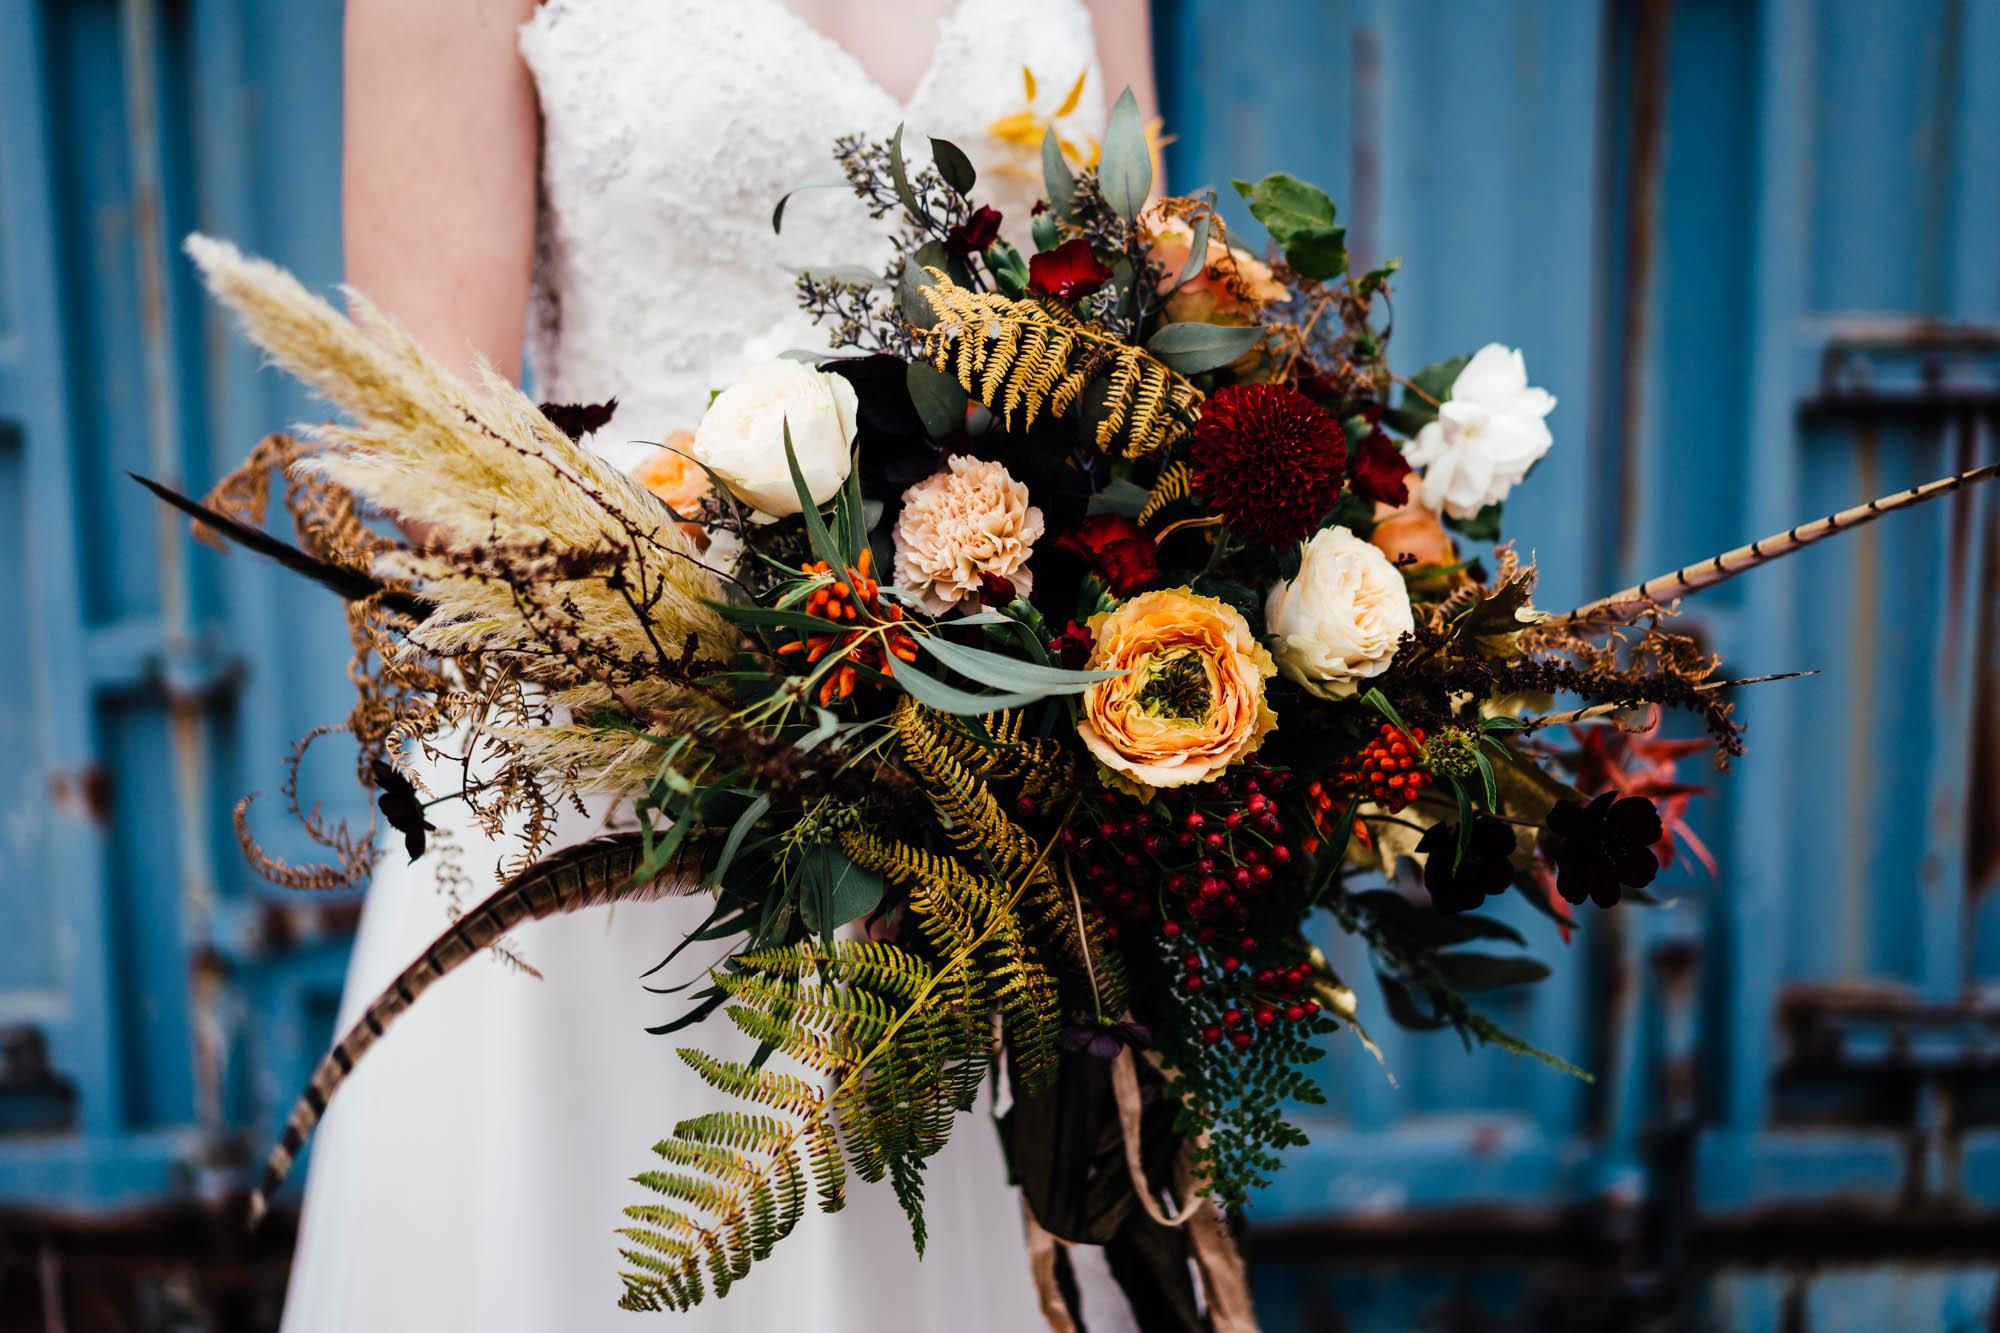 huntsmill-farm-wedding-inspiration-19